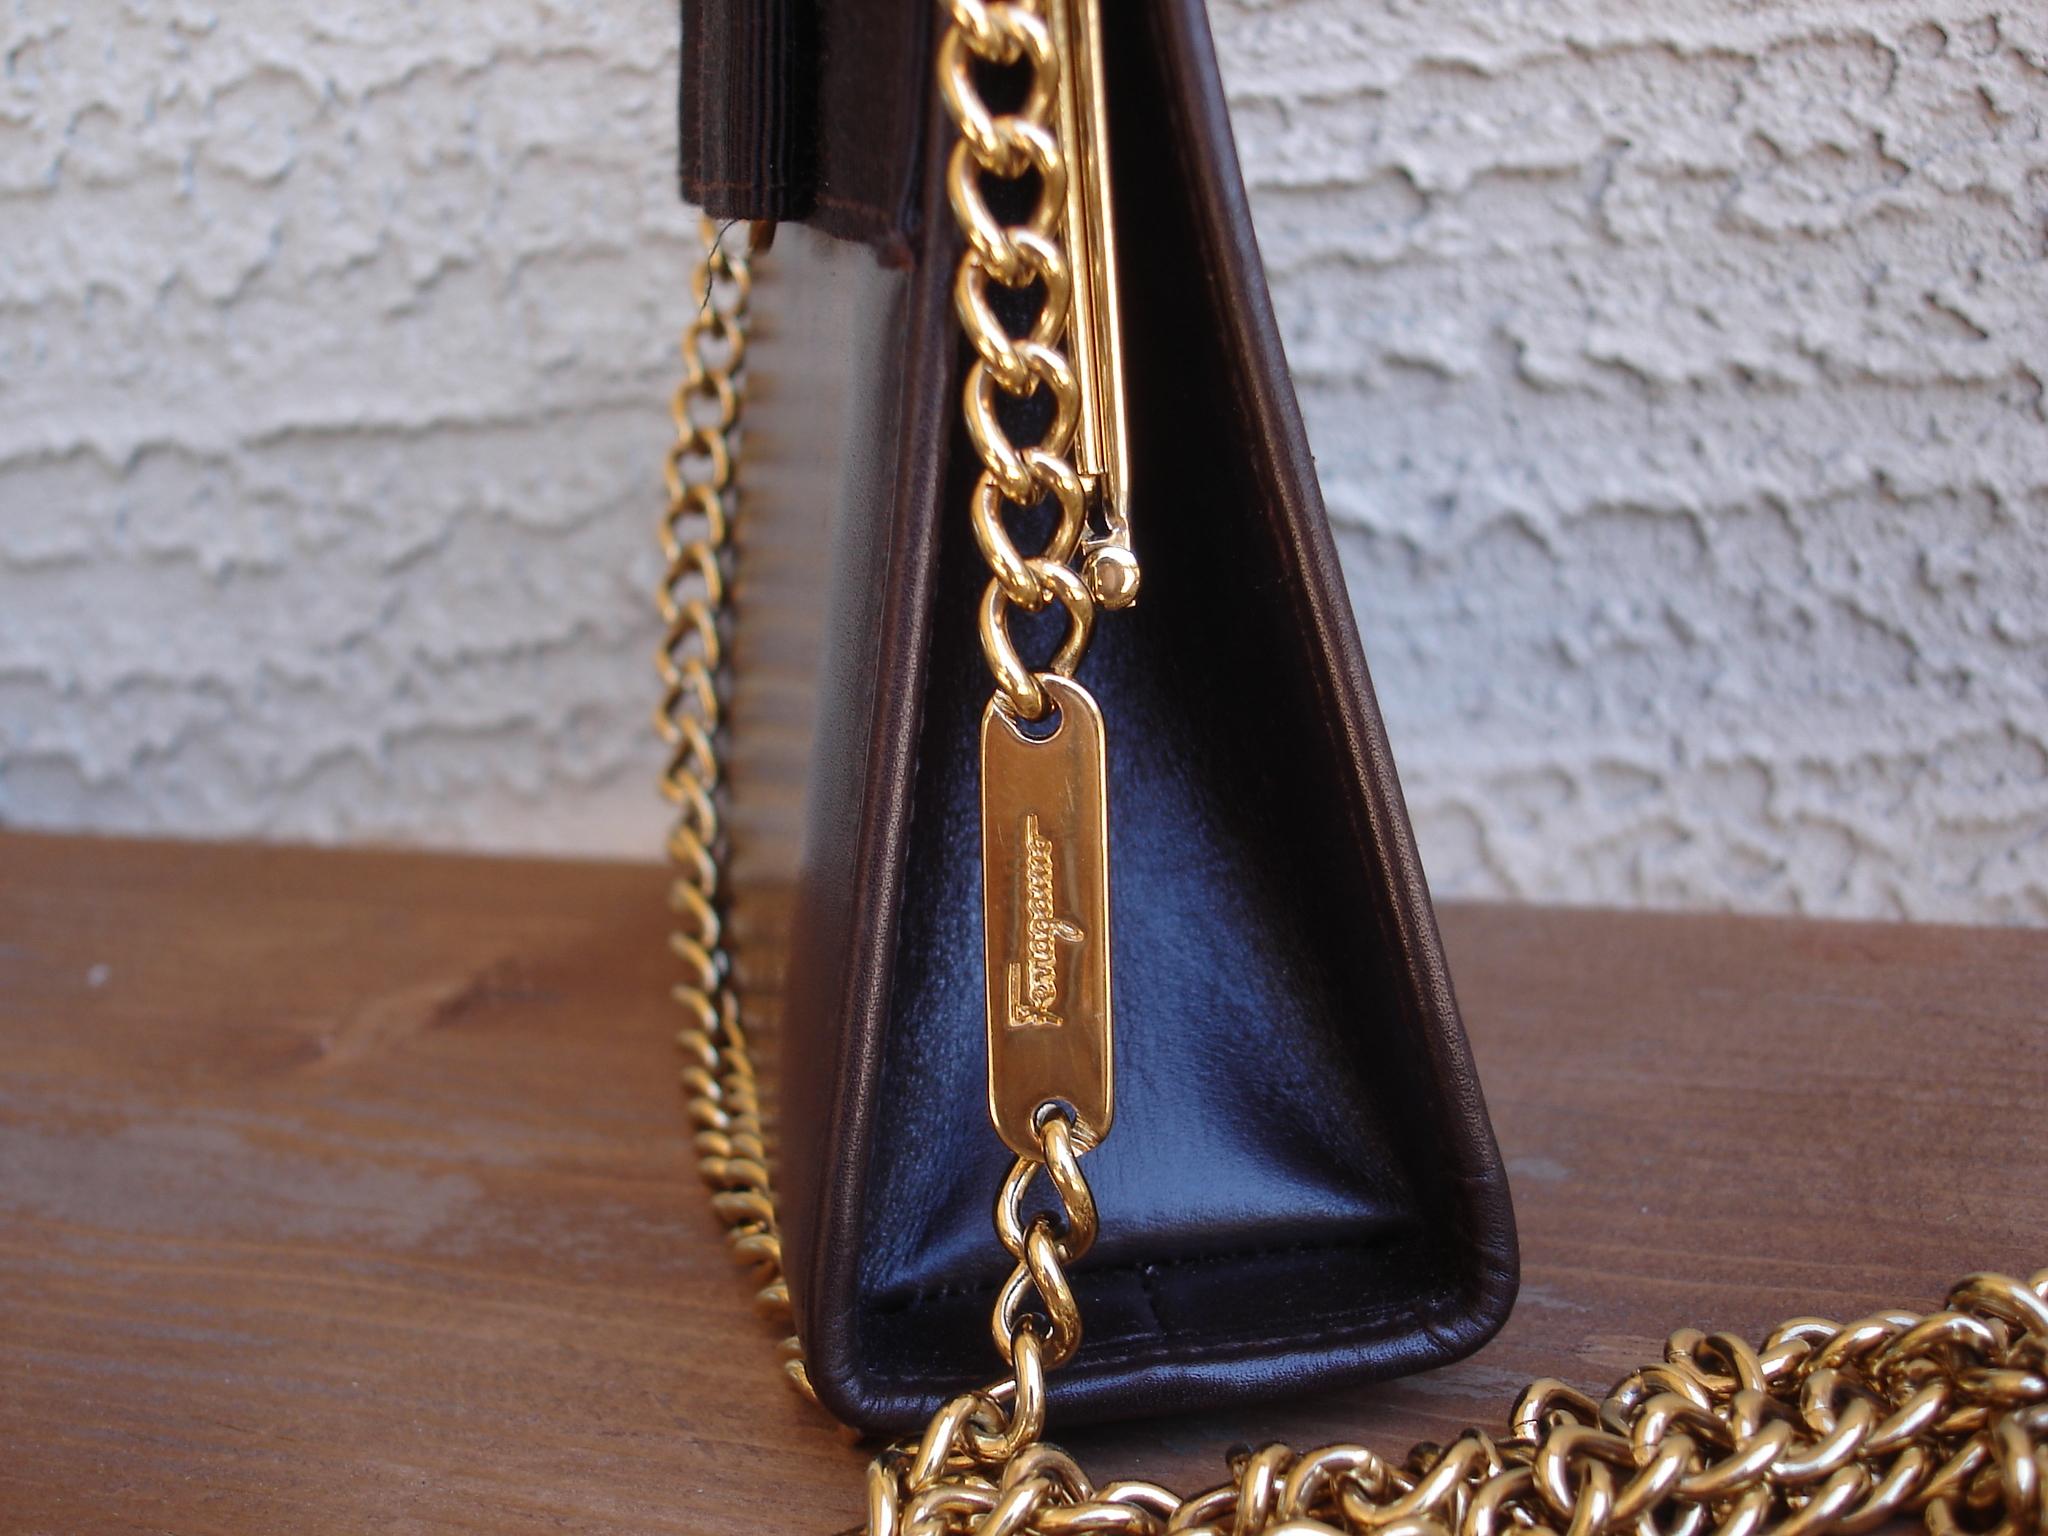 9f6ece2f6 Authentic Vintage Salvatore Ferragamo Vara Gold Chain Brown Leather Mini  Bag Pouch Purse - Thumbnail 1 ...